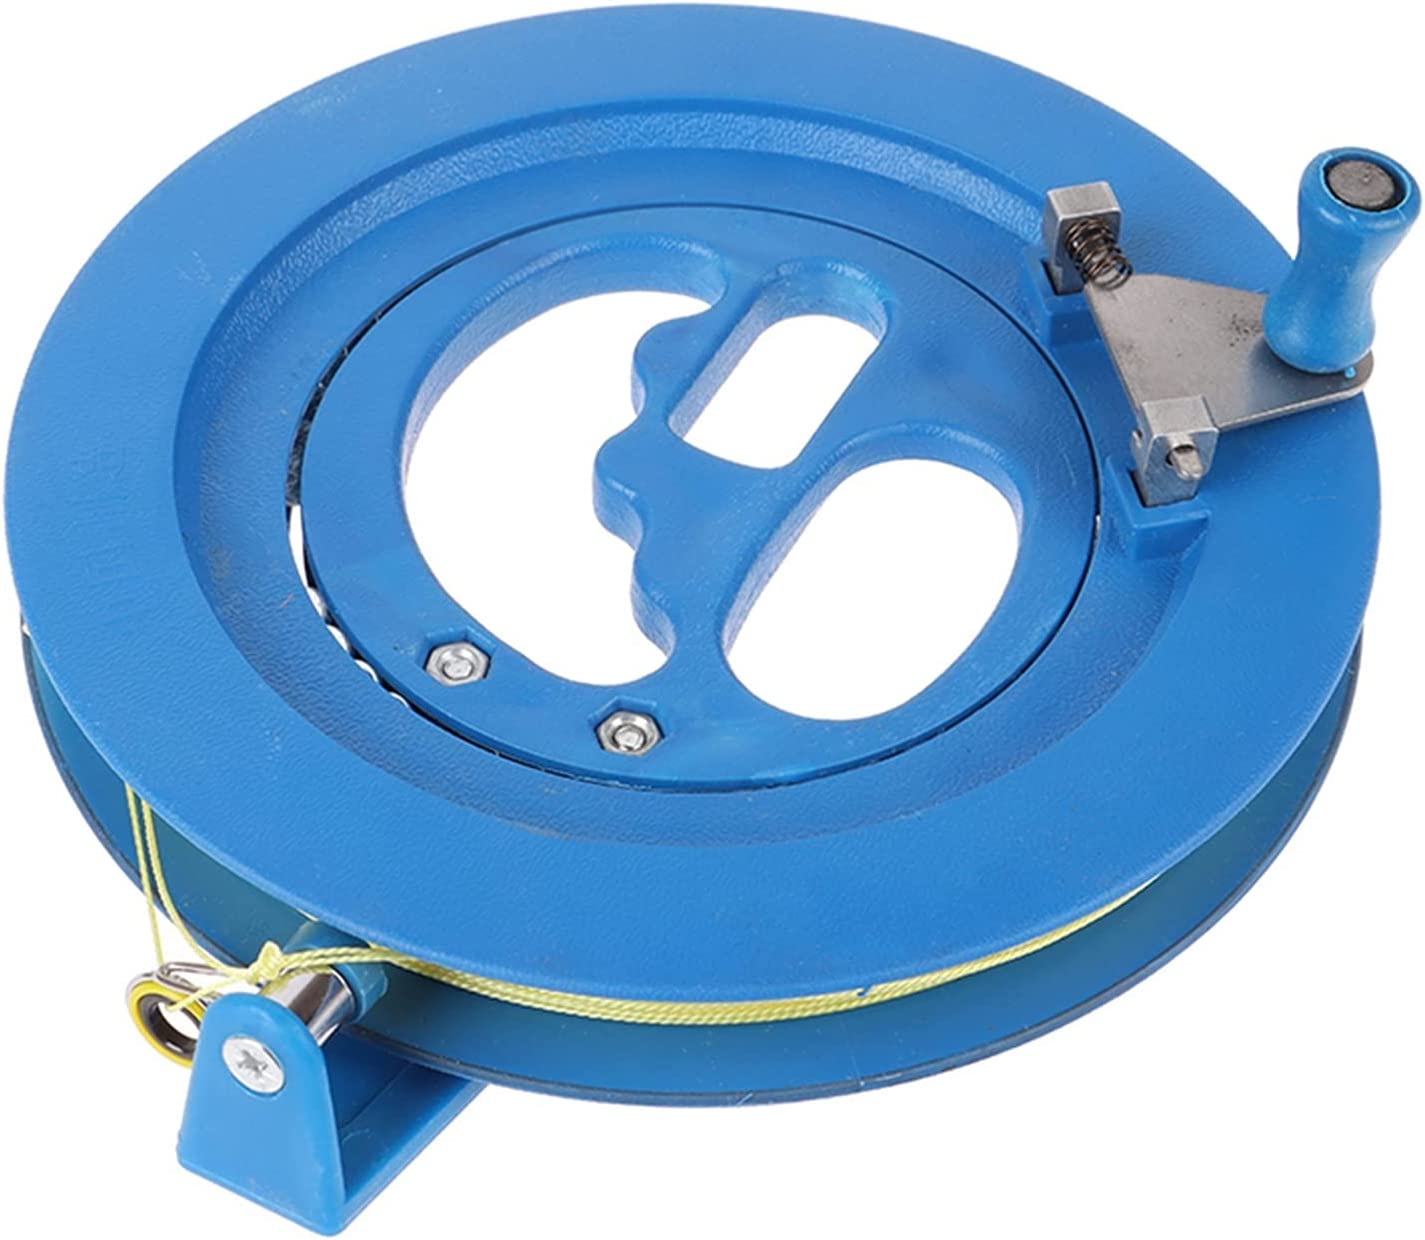 LXQS 5 ☆ popular Kite Reel Accessories 16cm Plastic Ranking TOP17 150M Blue ABS